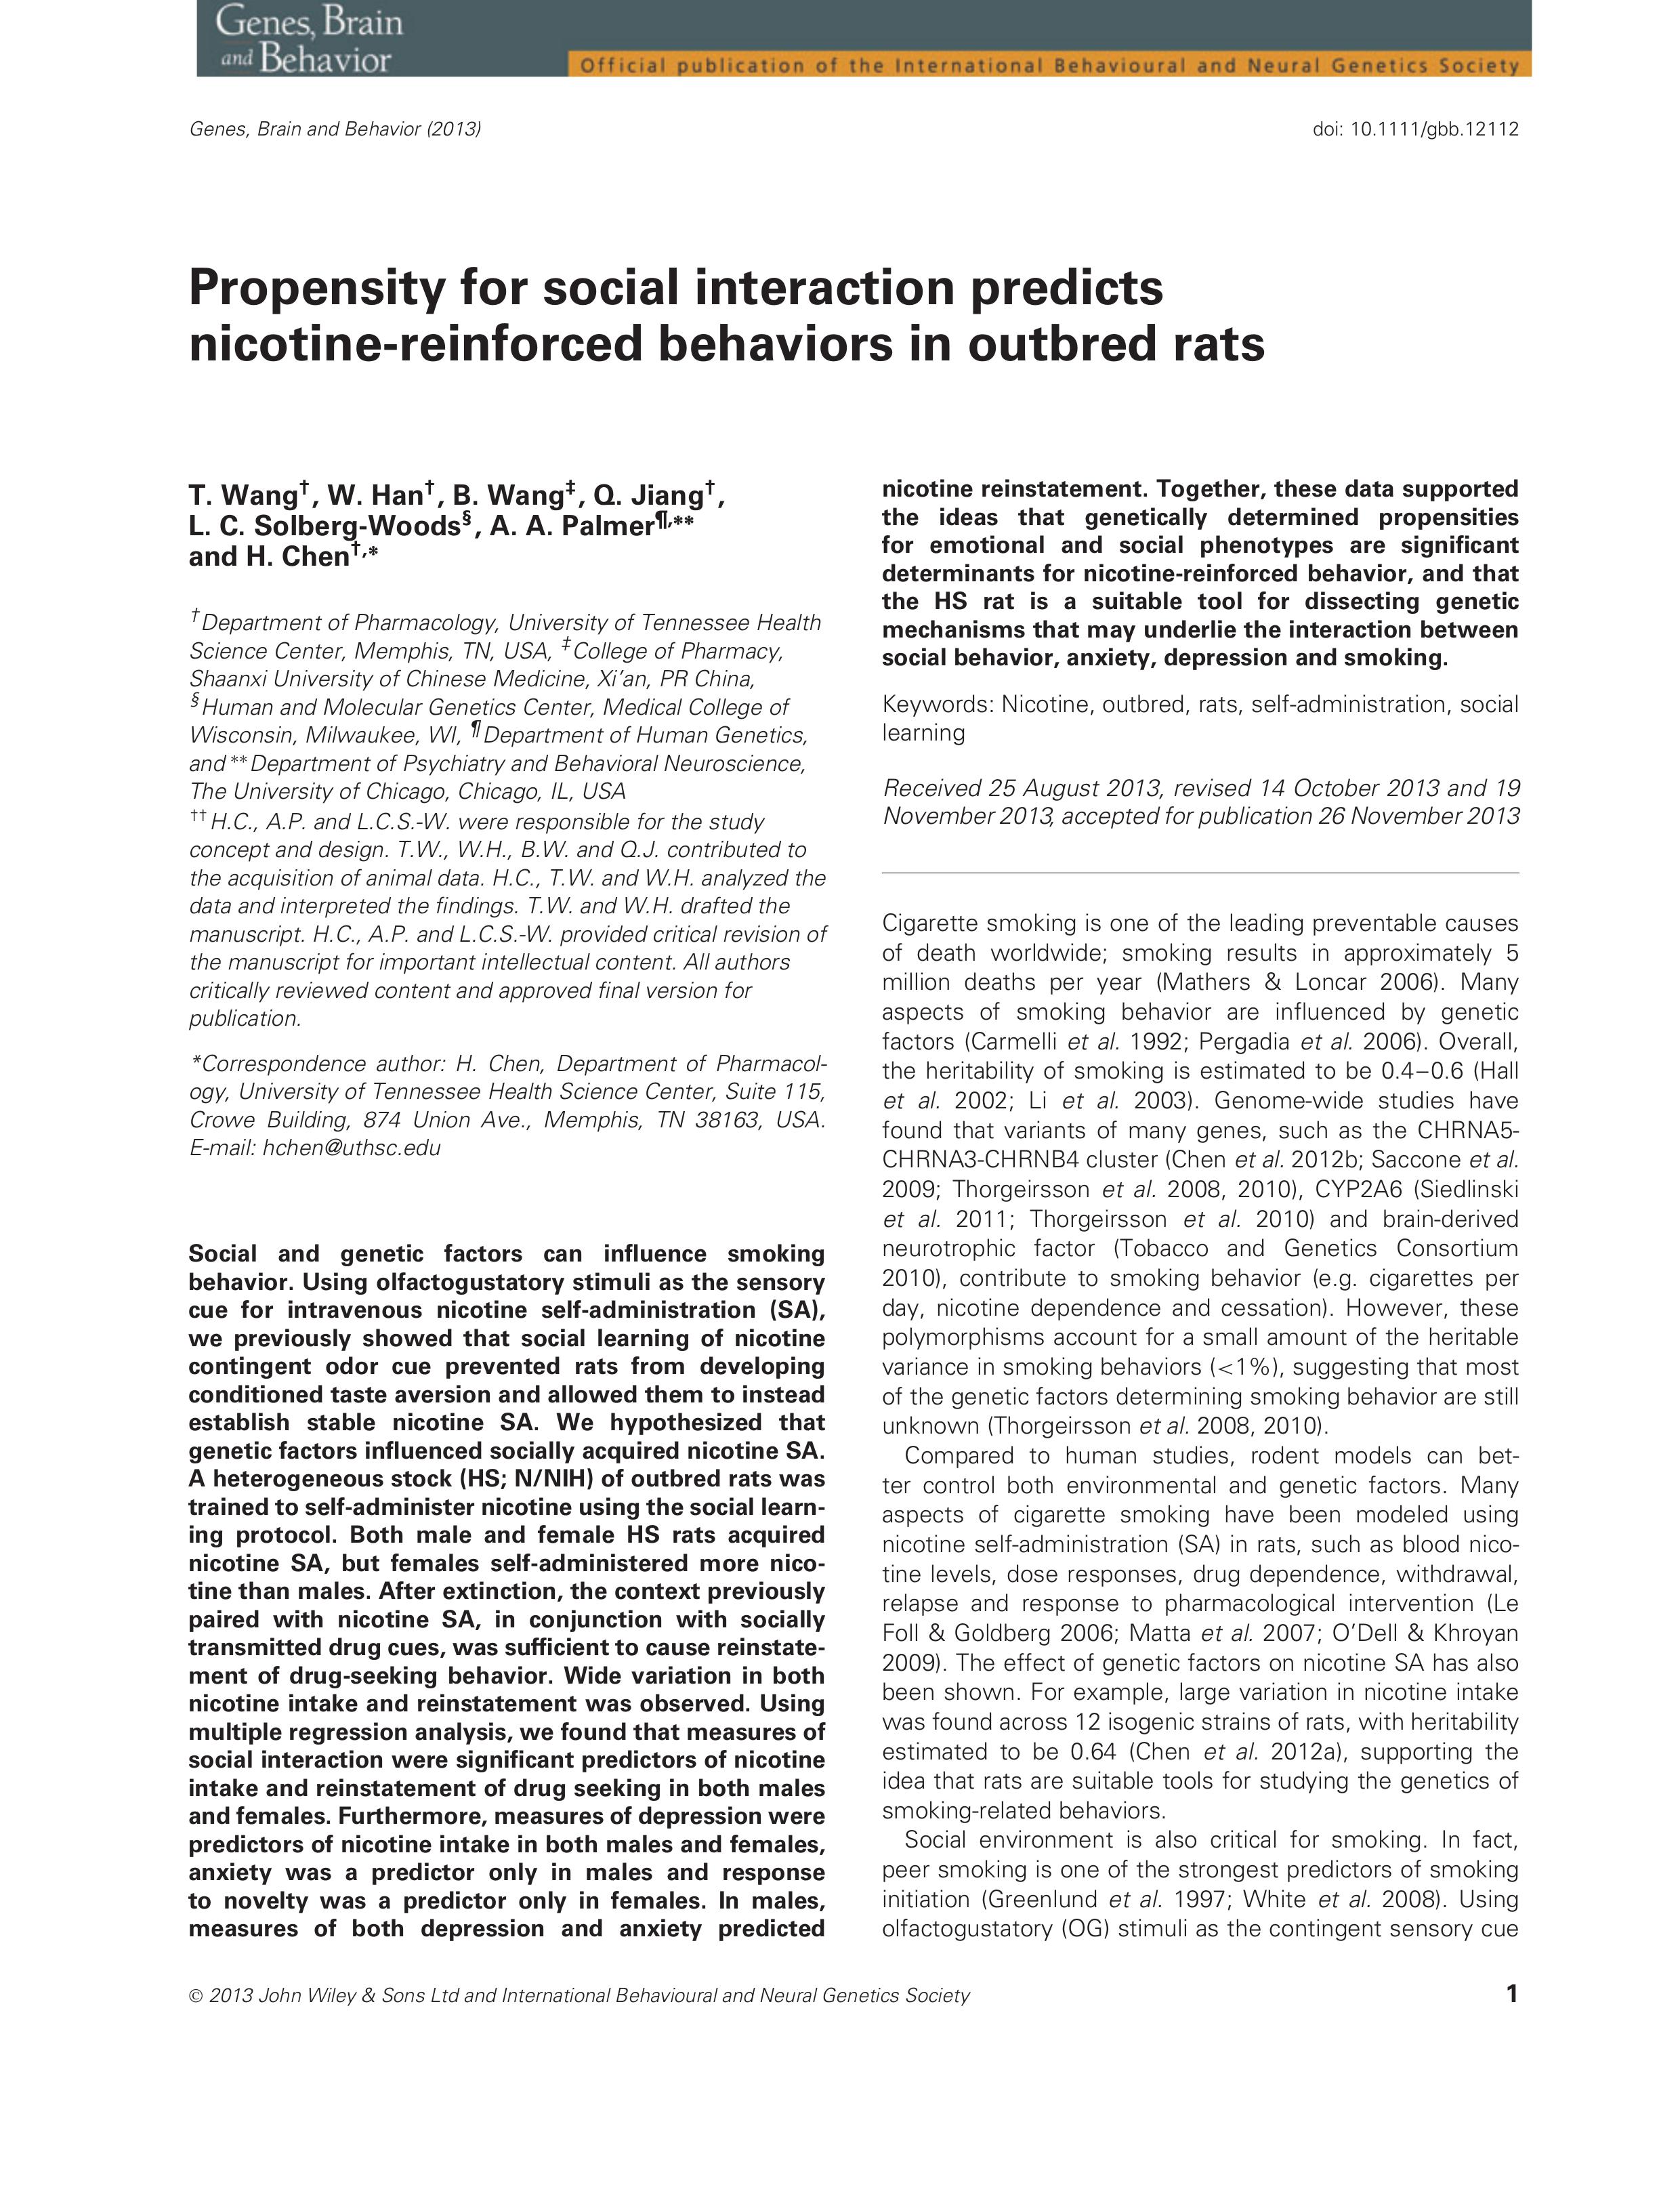 Wang et al. - 2013 - Genes, brain, and behavior.png